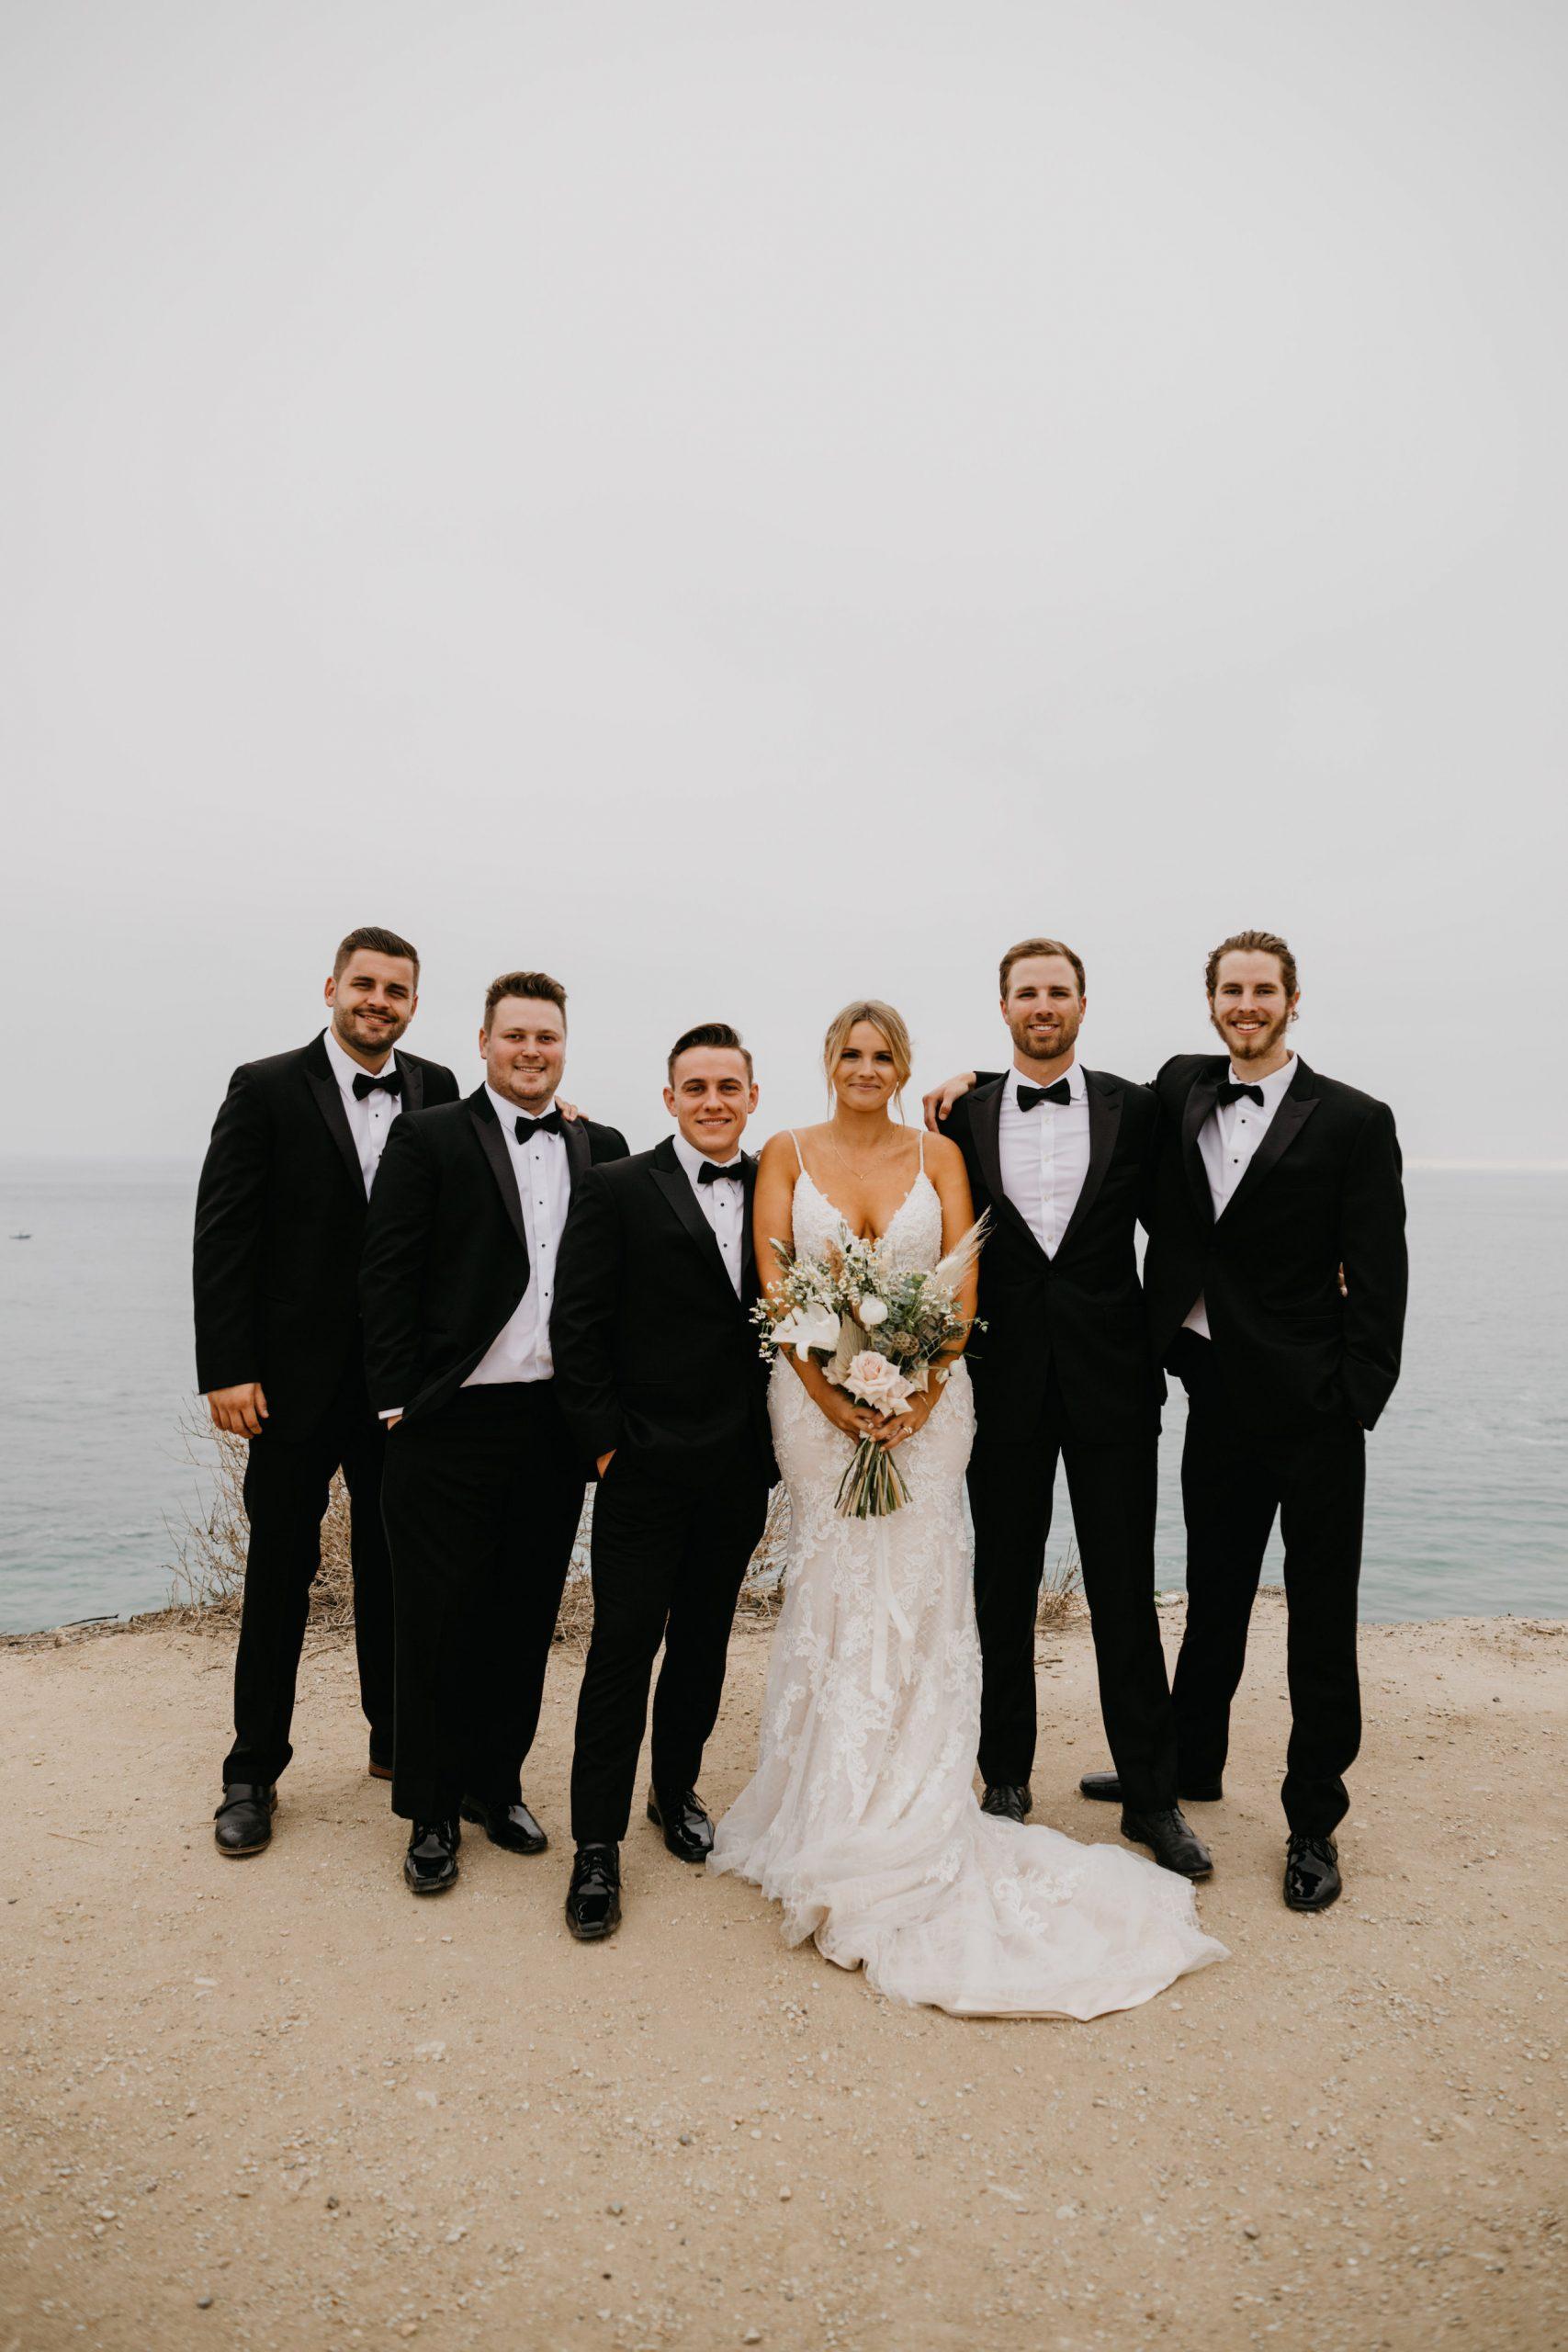 Bride and Groomsmen in Crystal Cove State Park Wedding in Laguna Beach, image by Fatima Elreda Photo